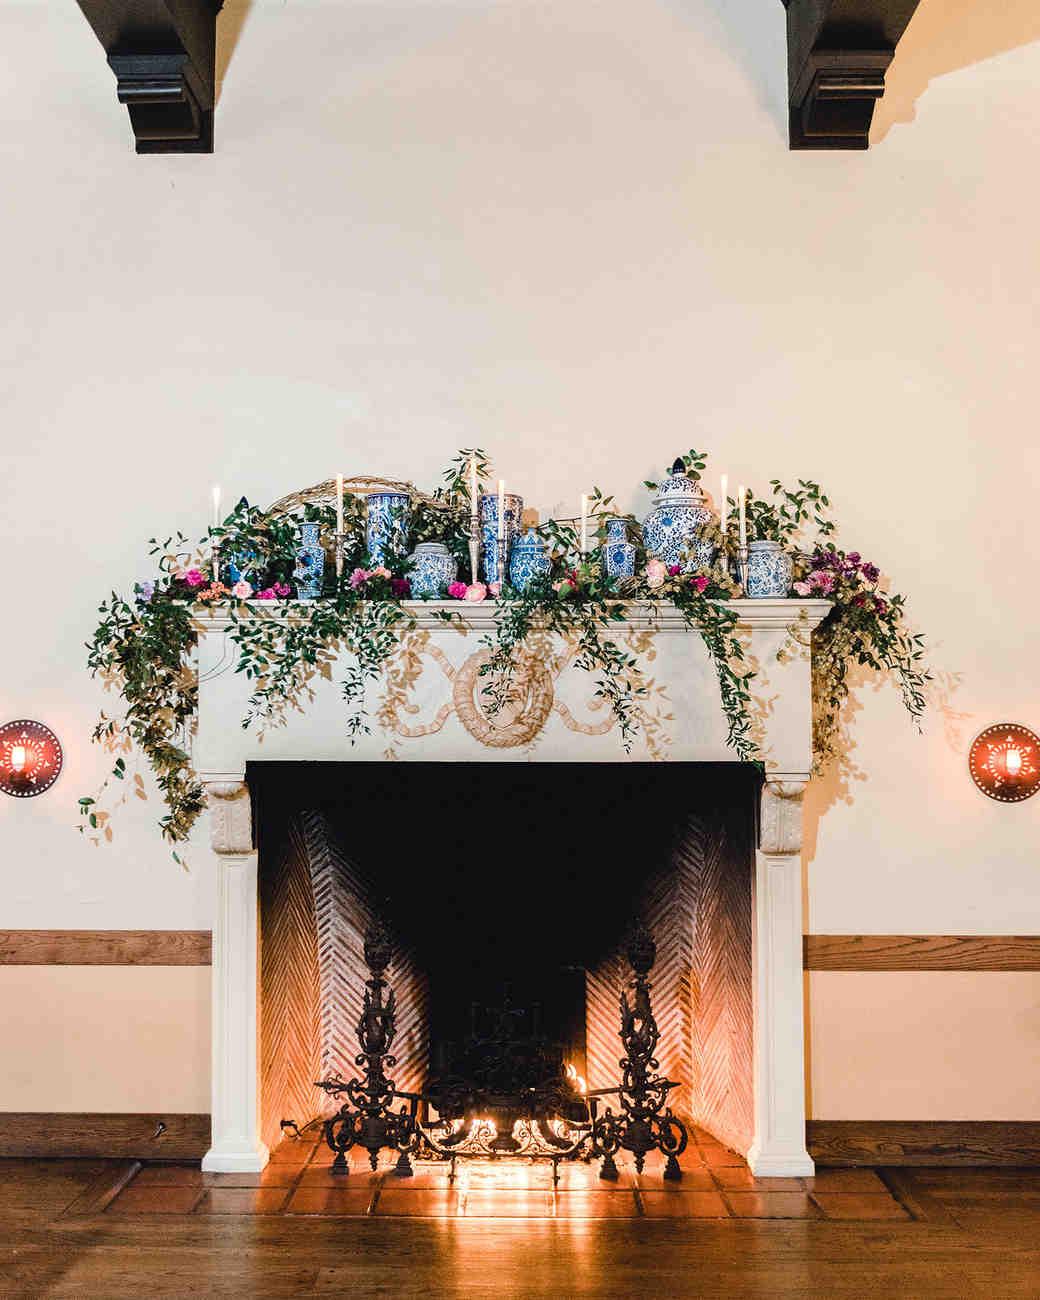 johanna erik wedding reception fireplace